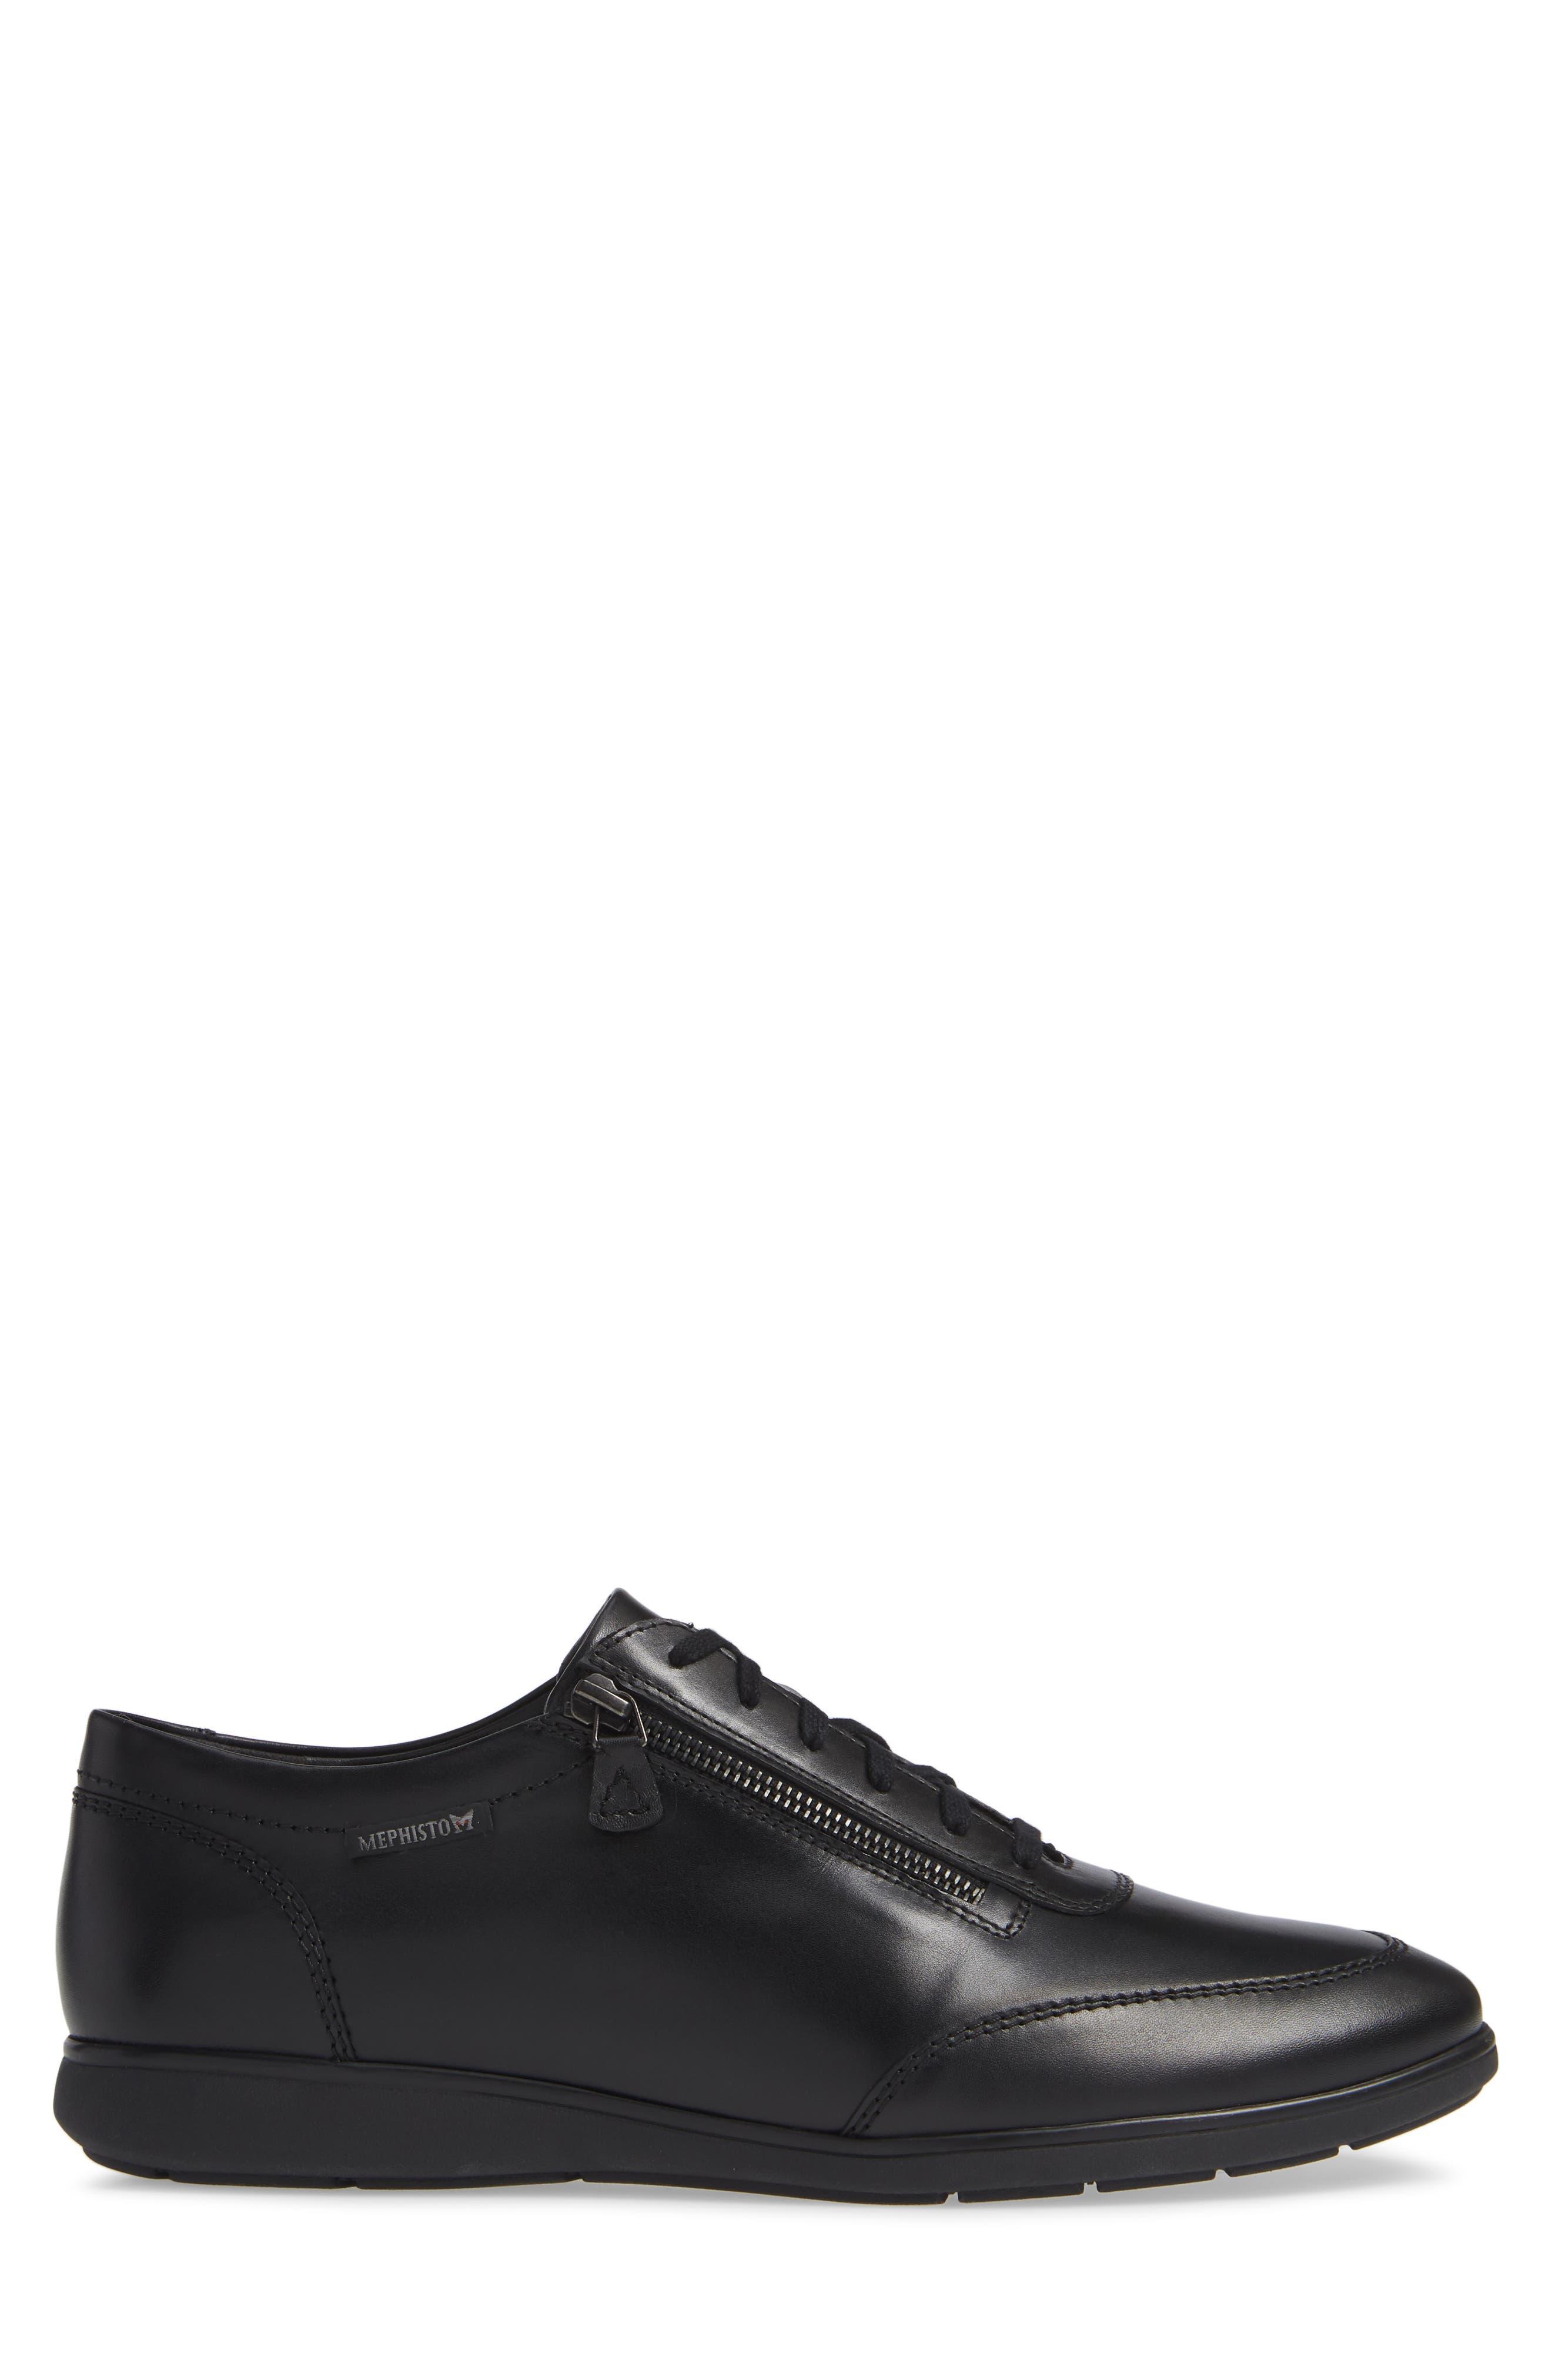 Laurent Zippered Low Top Sneaker,                             Alternate thumbnail 3, color,                             001